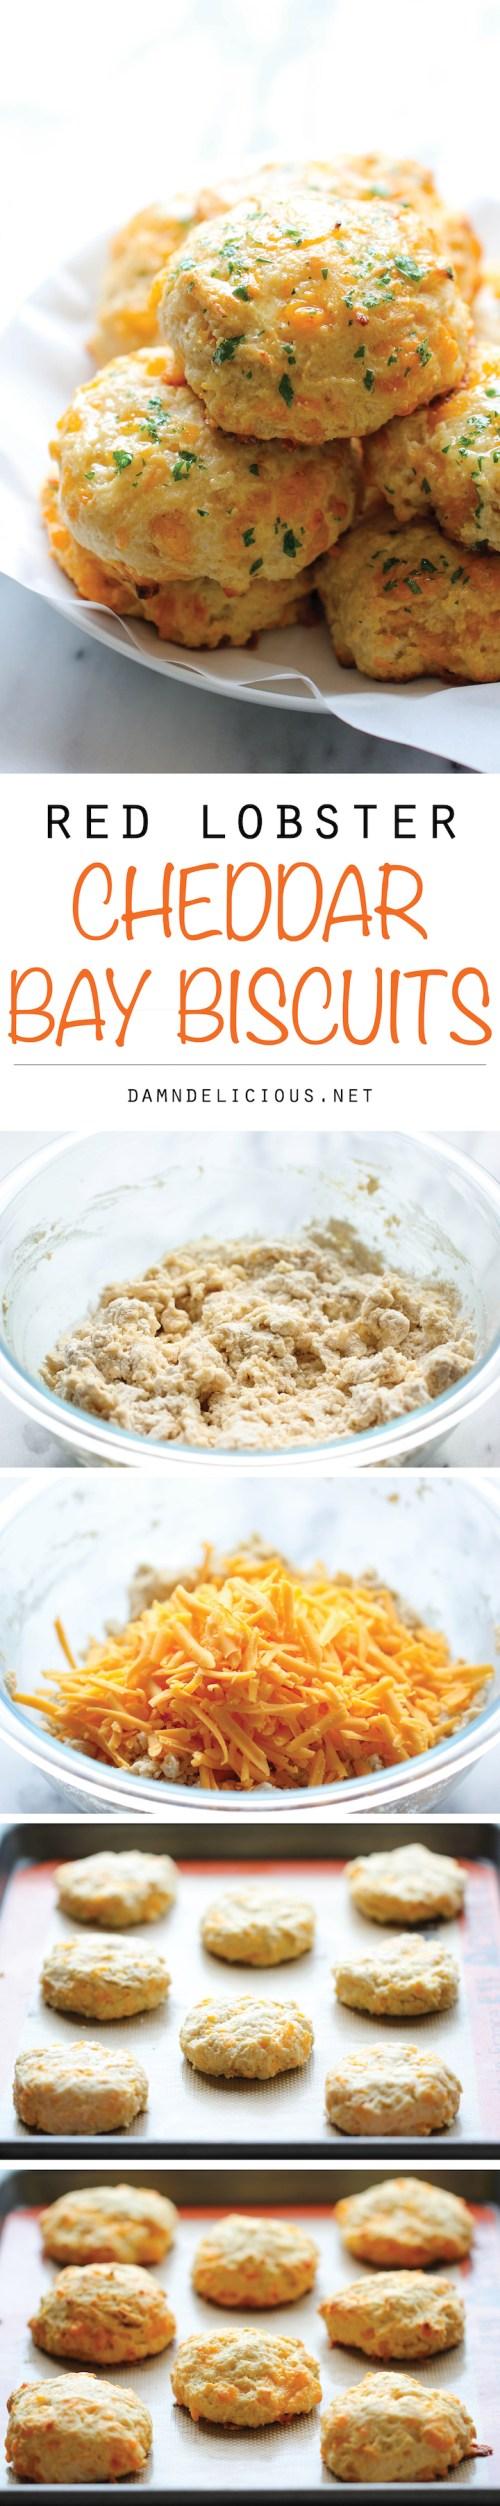 Medium Of Cheddar Bay Biscuit Recipe